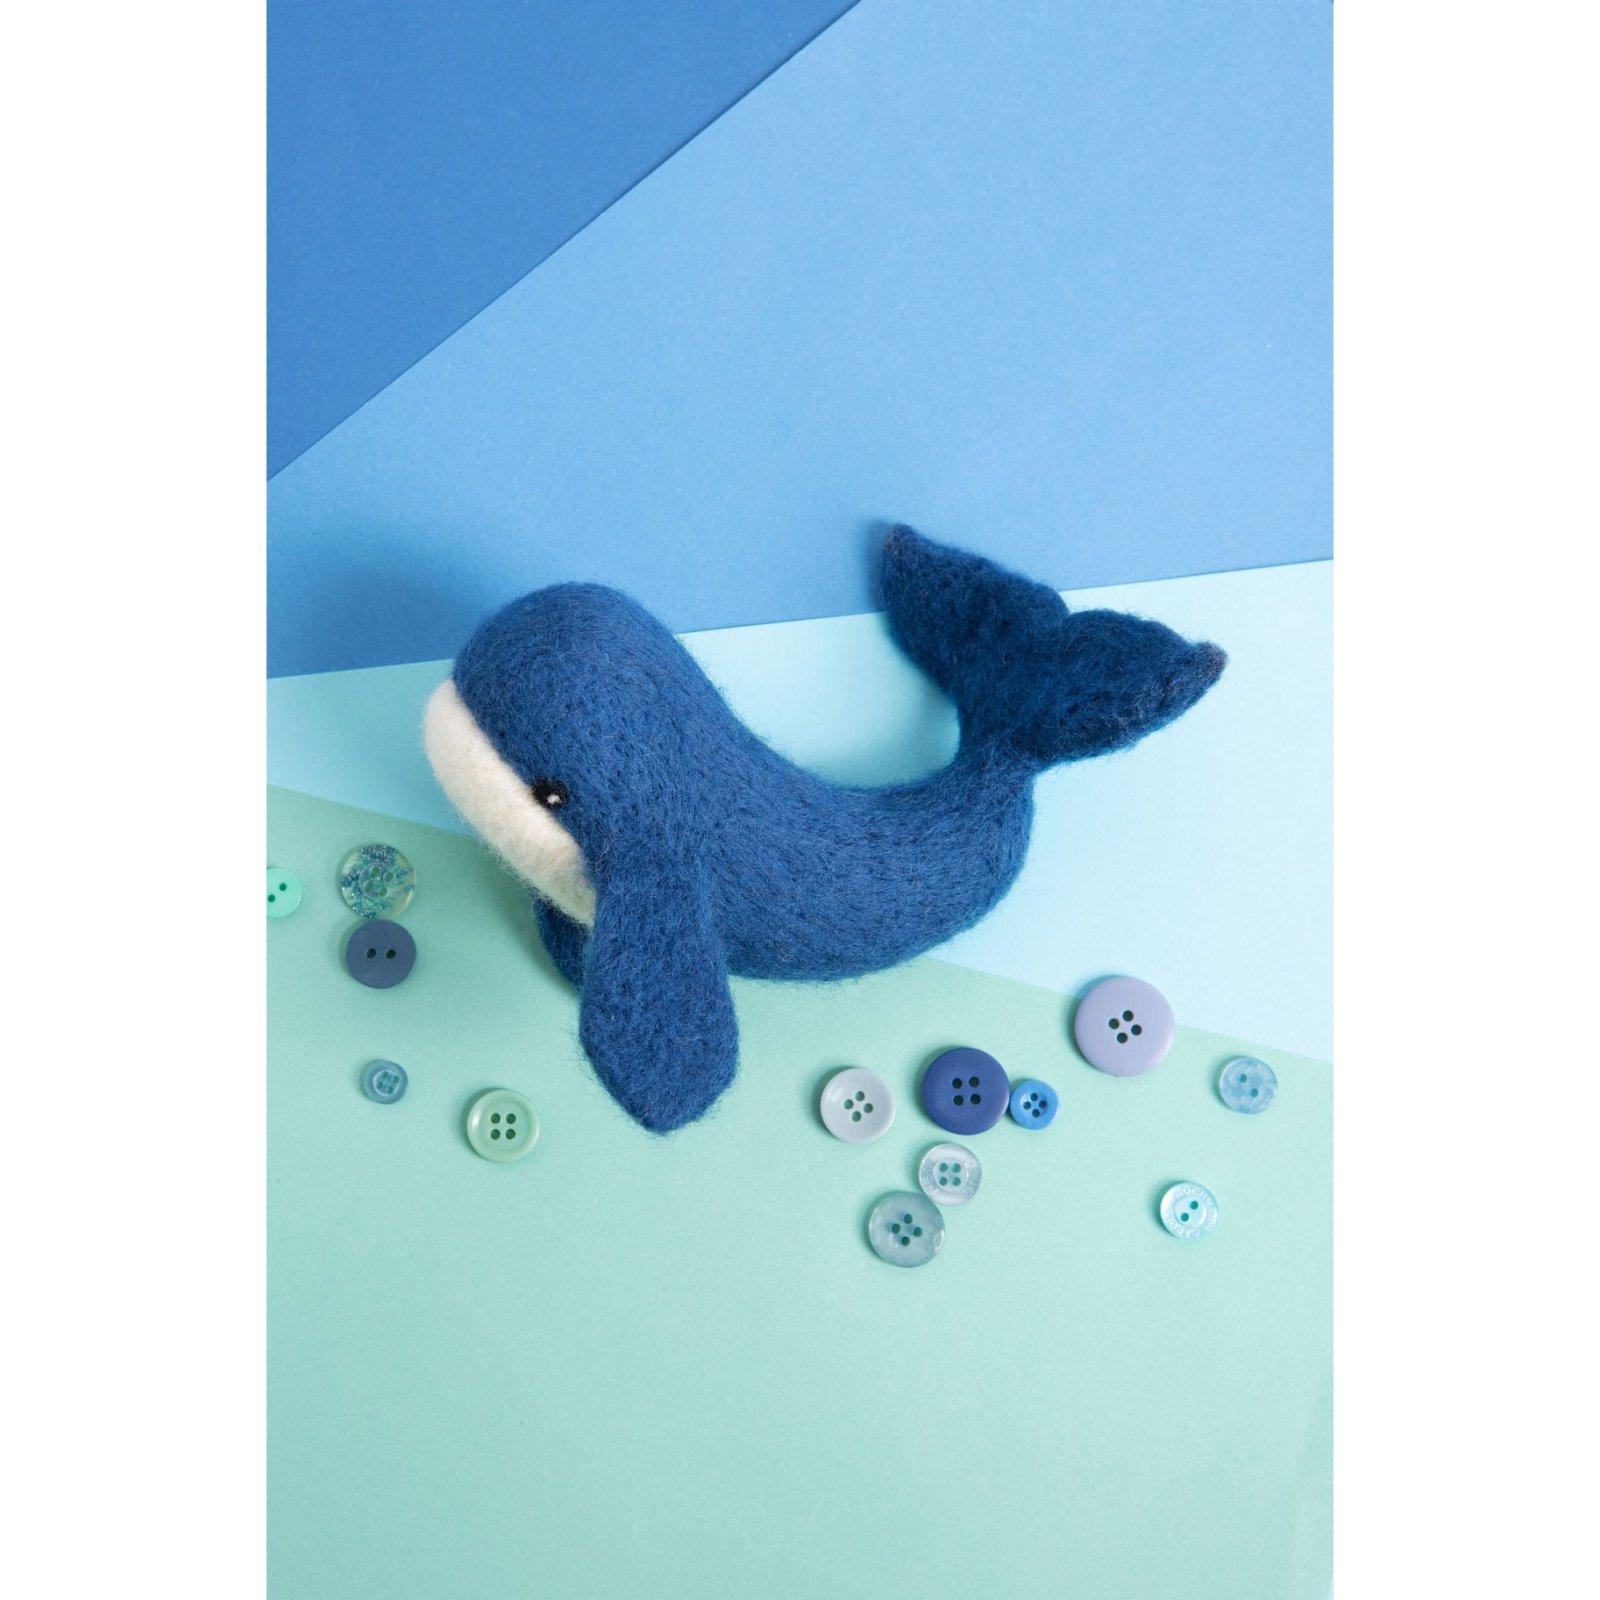 Hawthorn Handmade Whale Needle Felting Kit